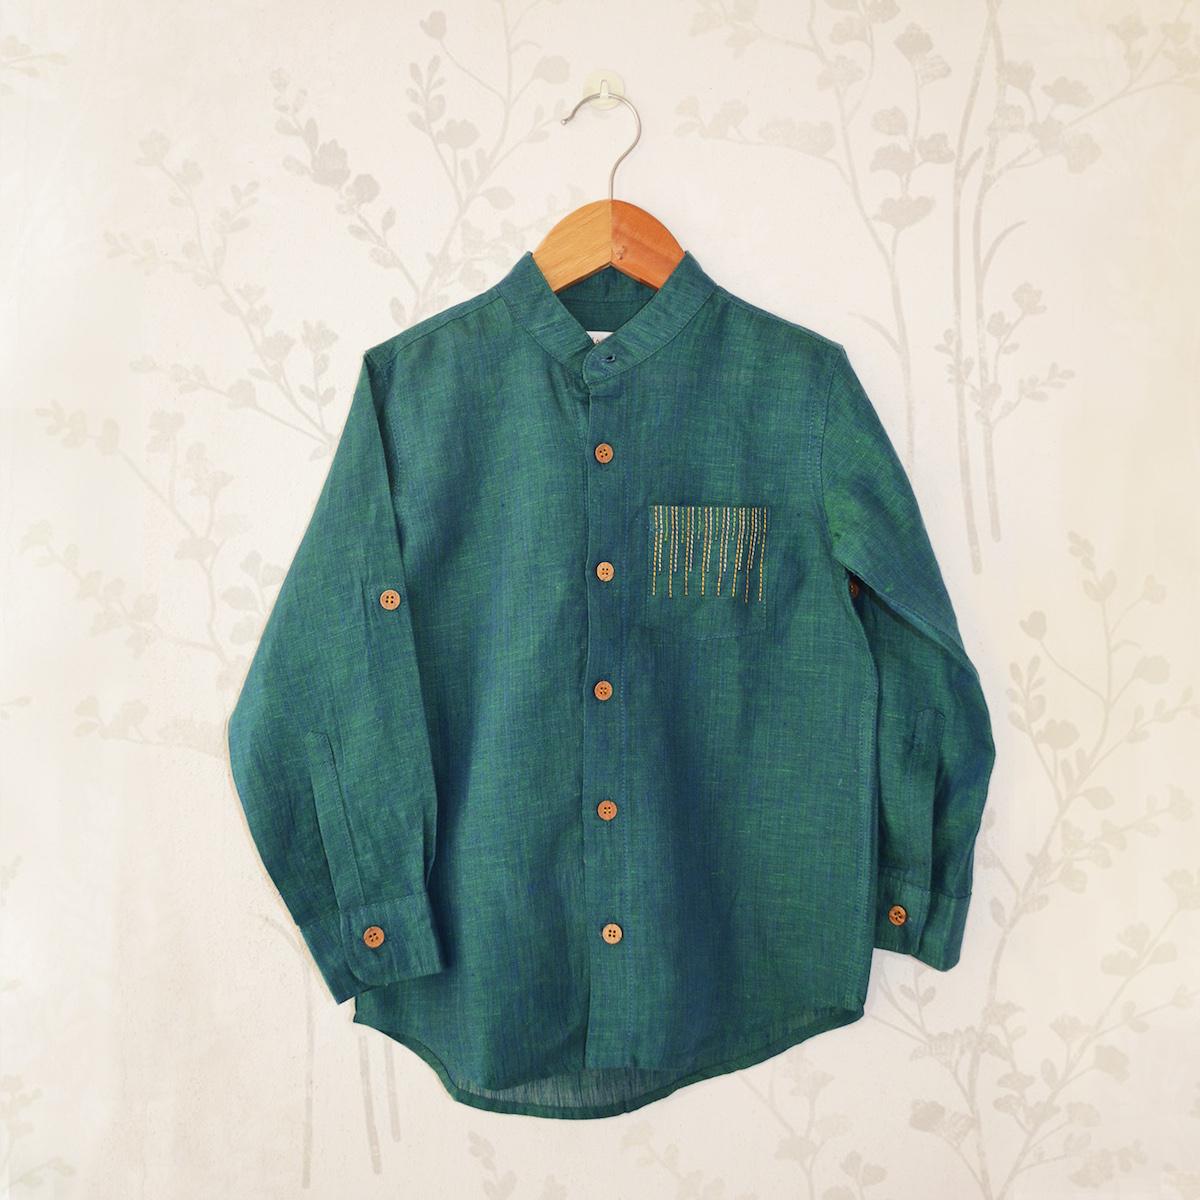 a3aba4928ac Boys  Royal Green Shirt - Liz Jacob  Elegant Handcrafted Kids Wear